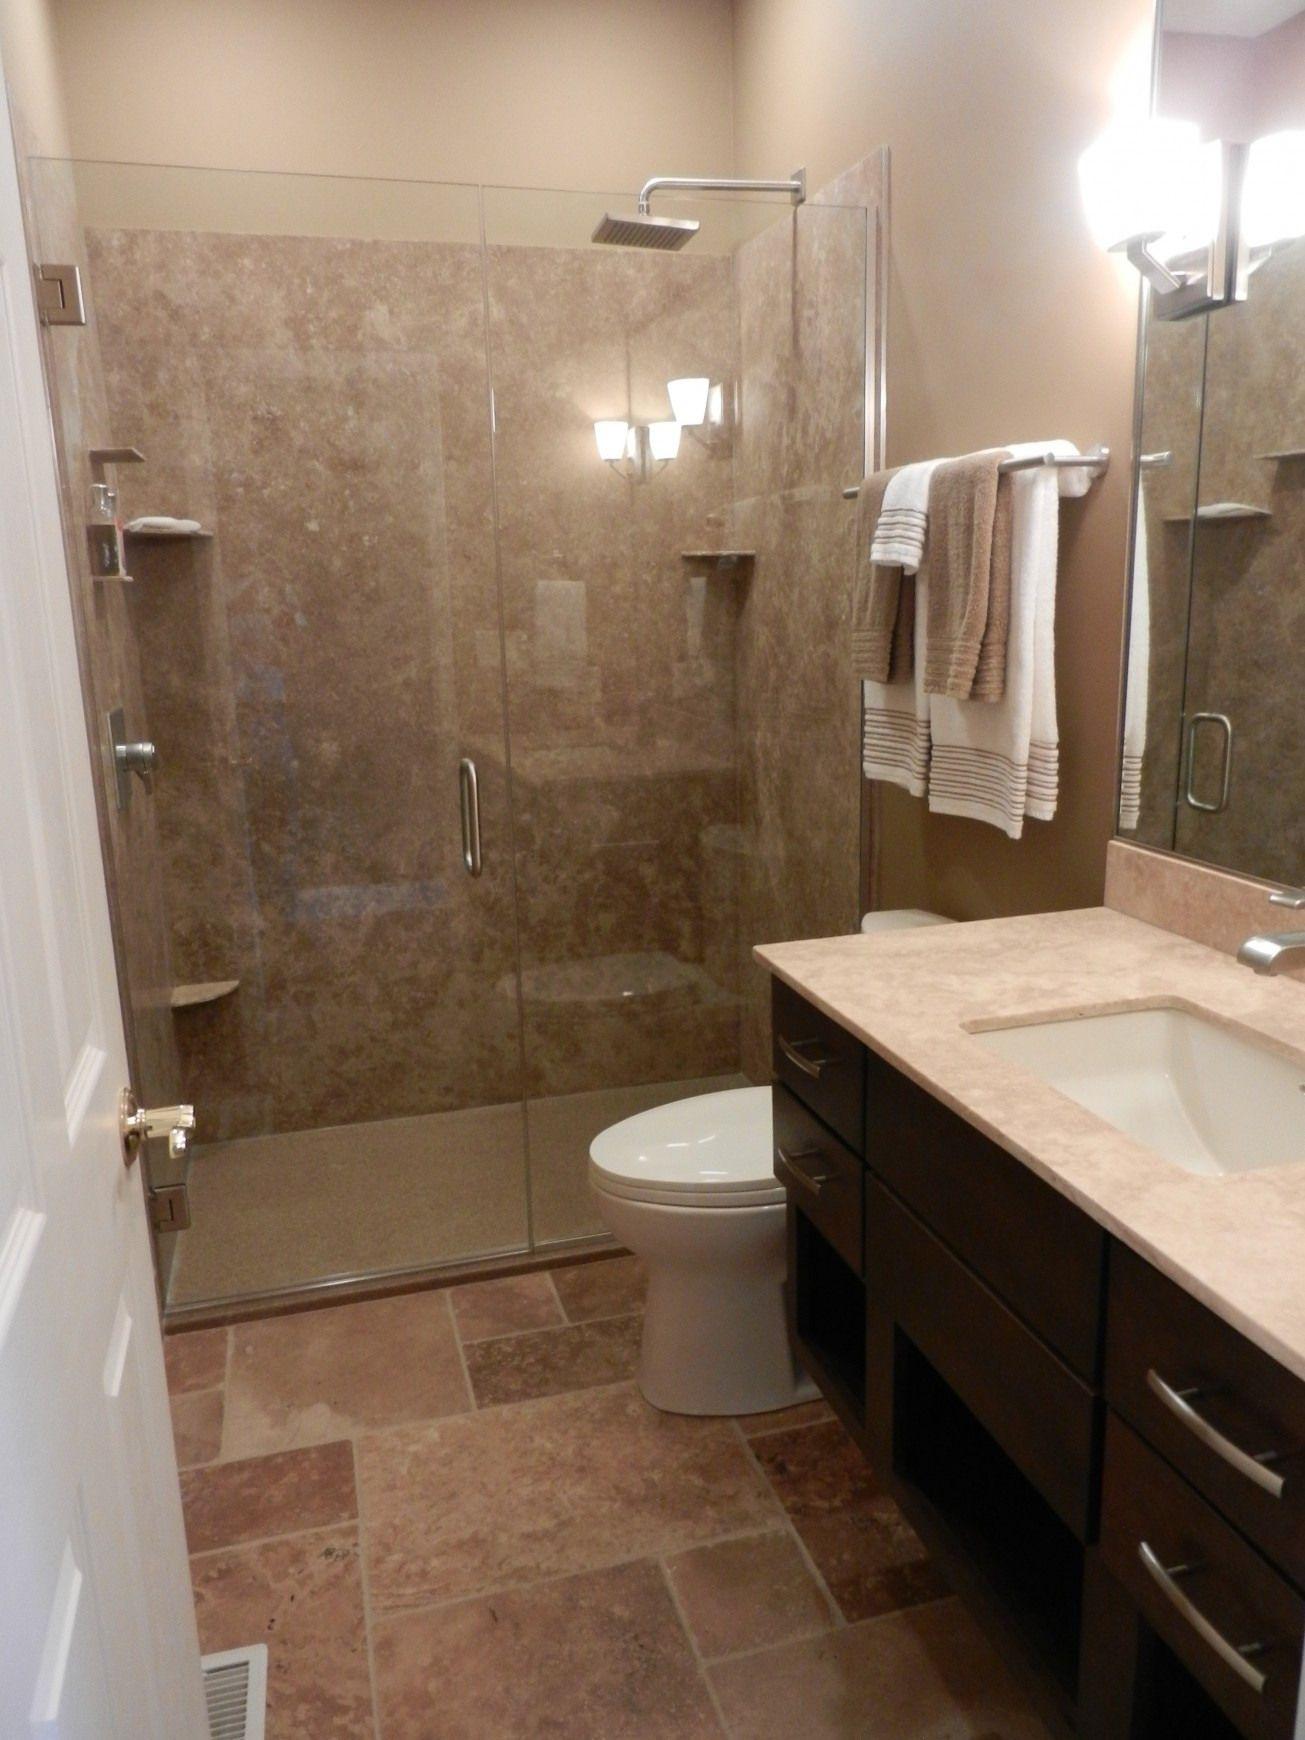 Image Result For Bathroom Design 6 X 7 Bathroom Design Tool Bathroom Layout Bathroom Floor Plans